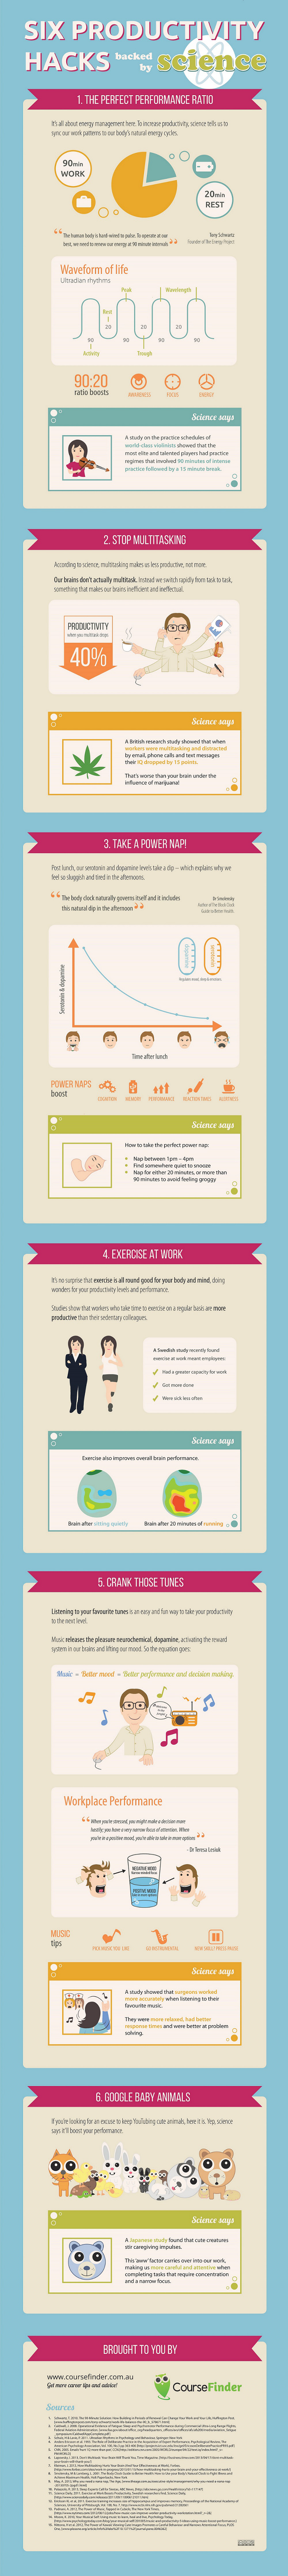 Improve-Productivity